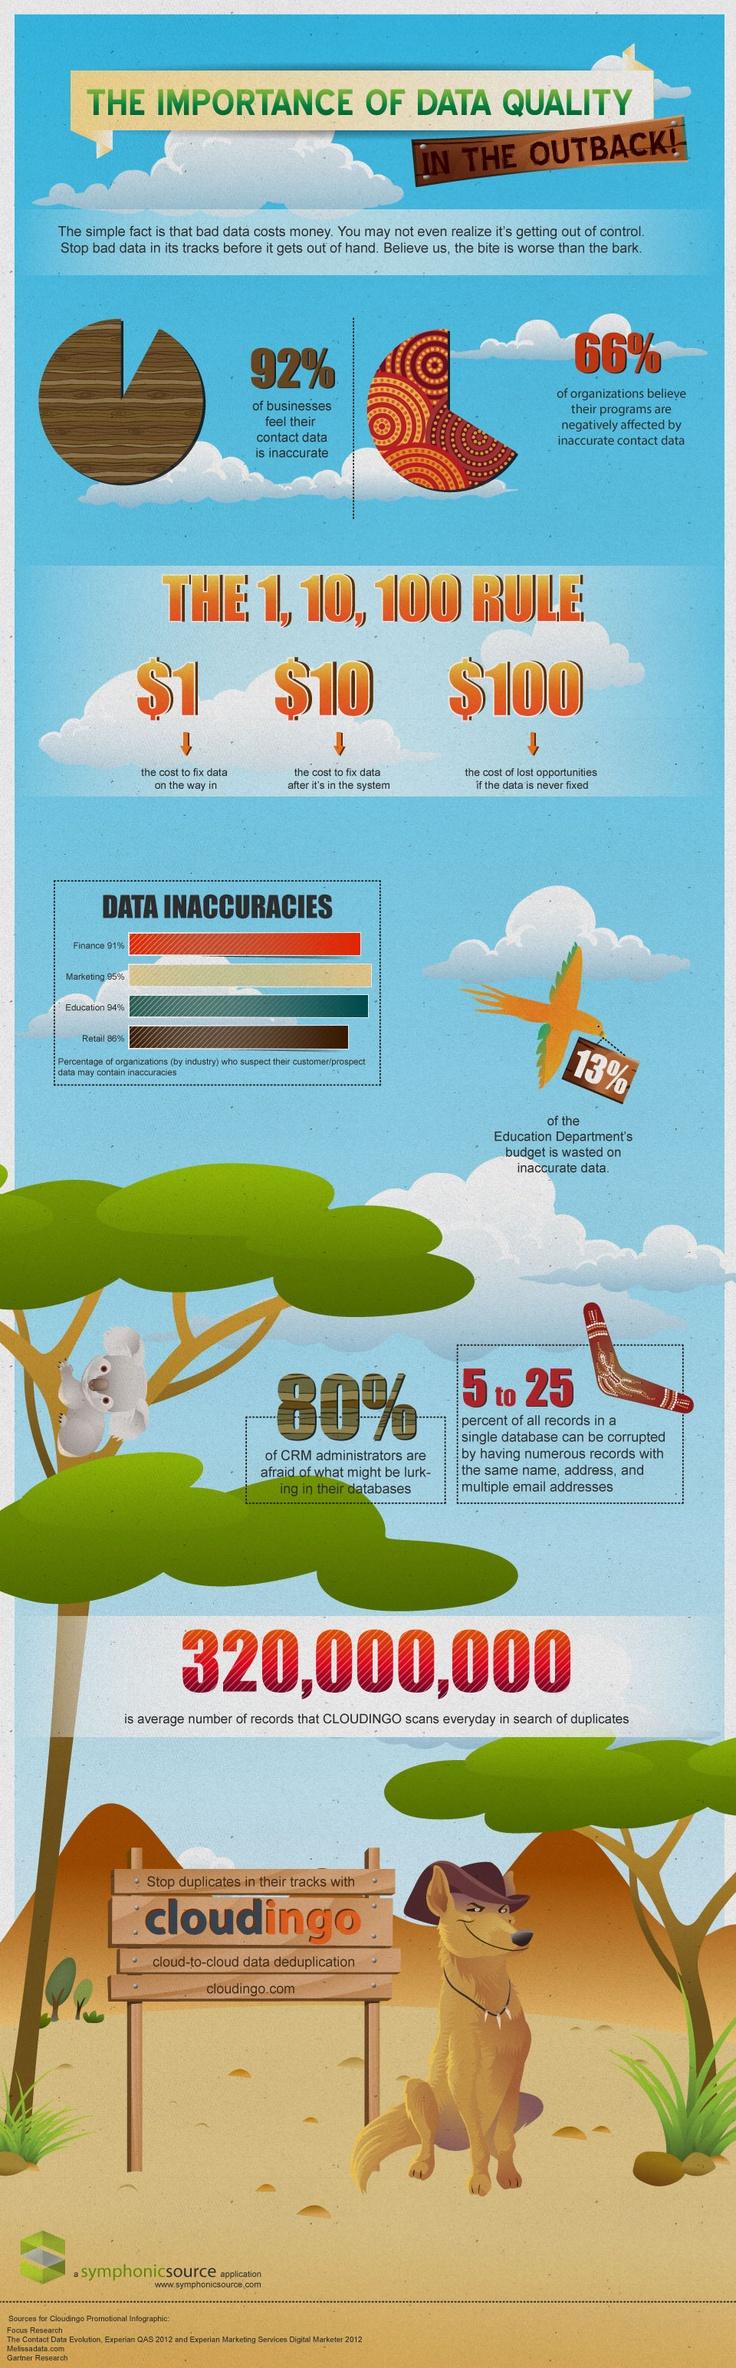 Importance of Data Quality Infographic  #Salesforce Data Quality app #cloudingo  #dedupe #deduplication